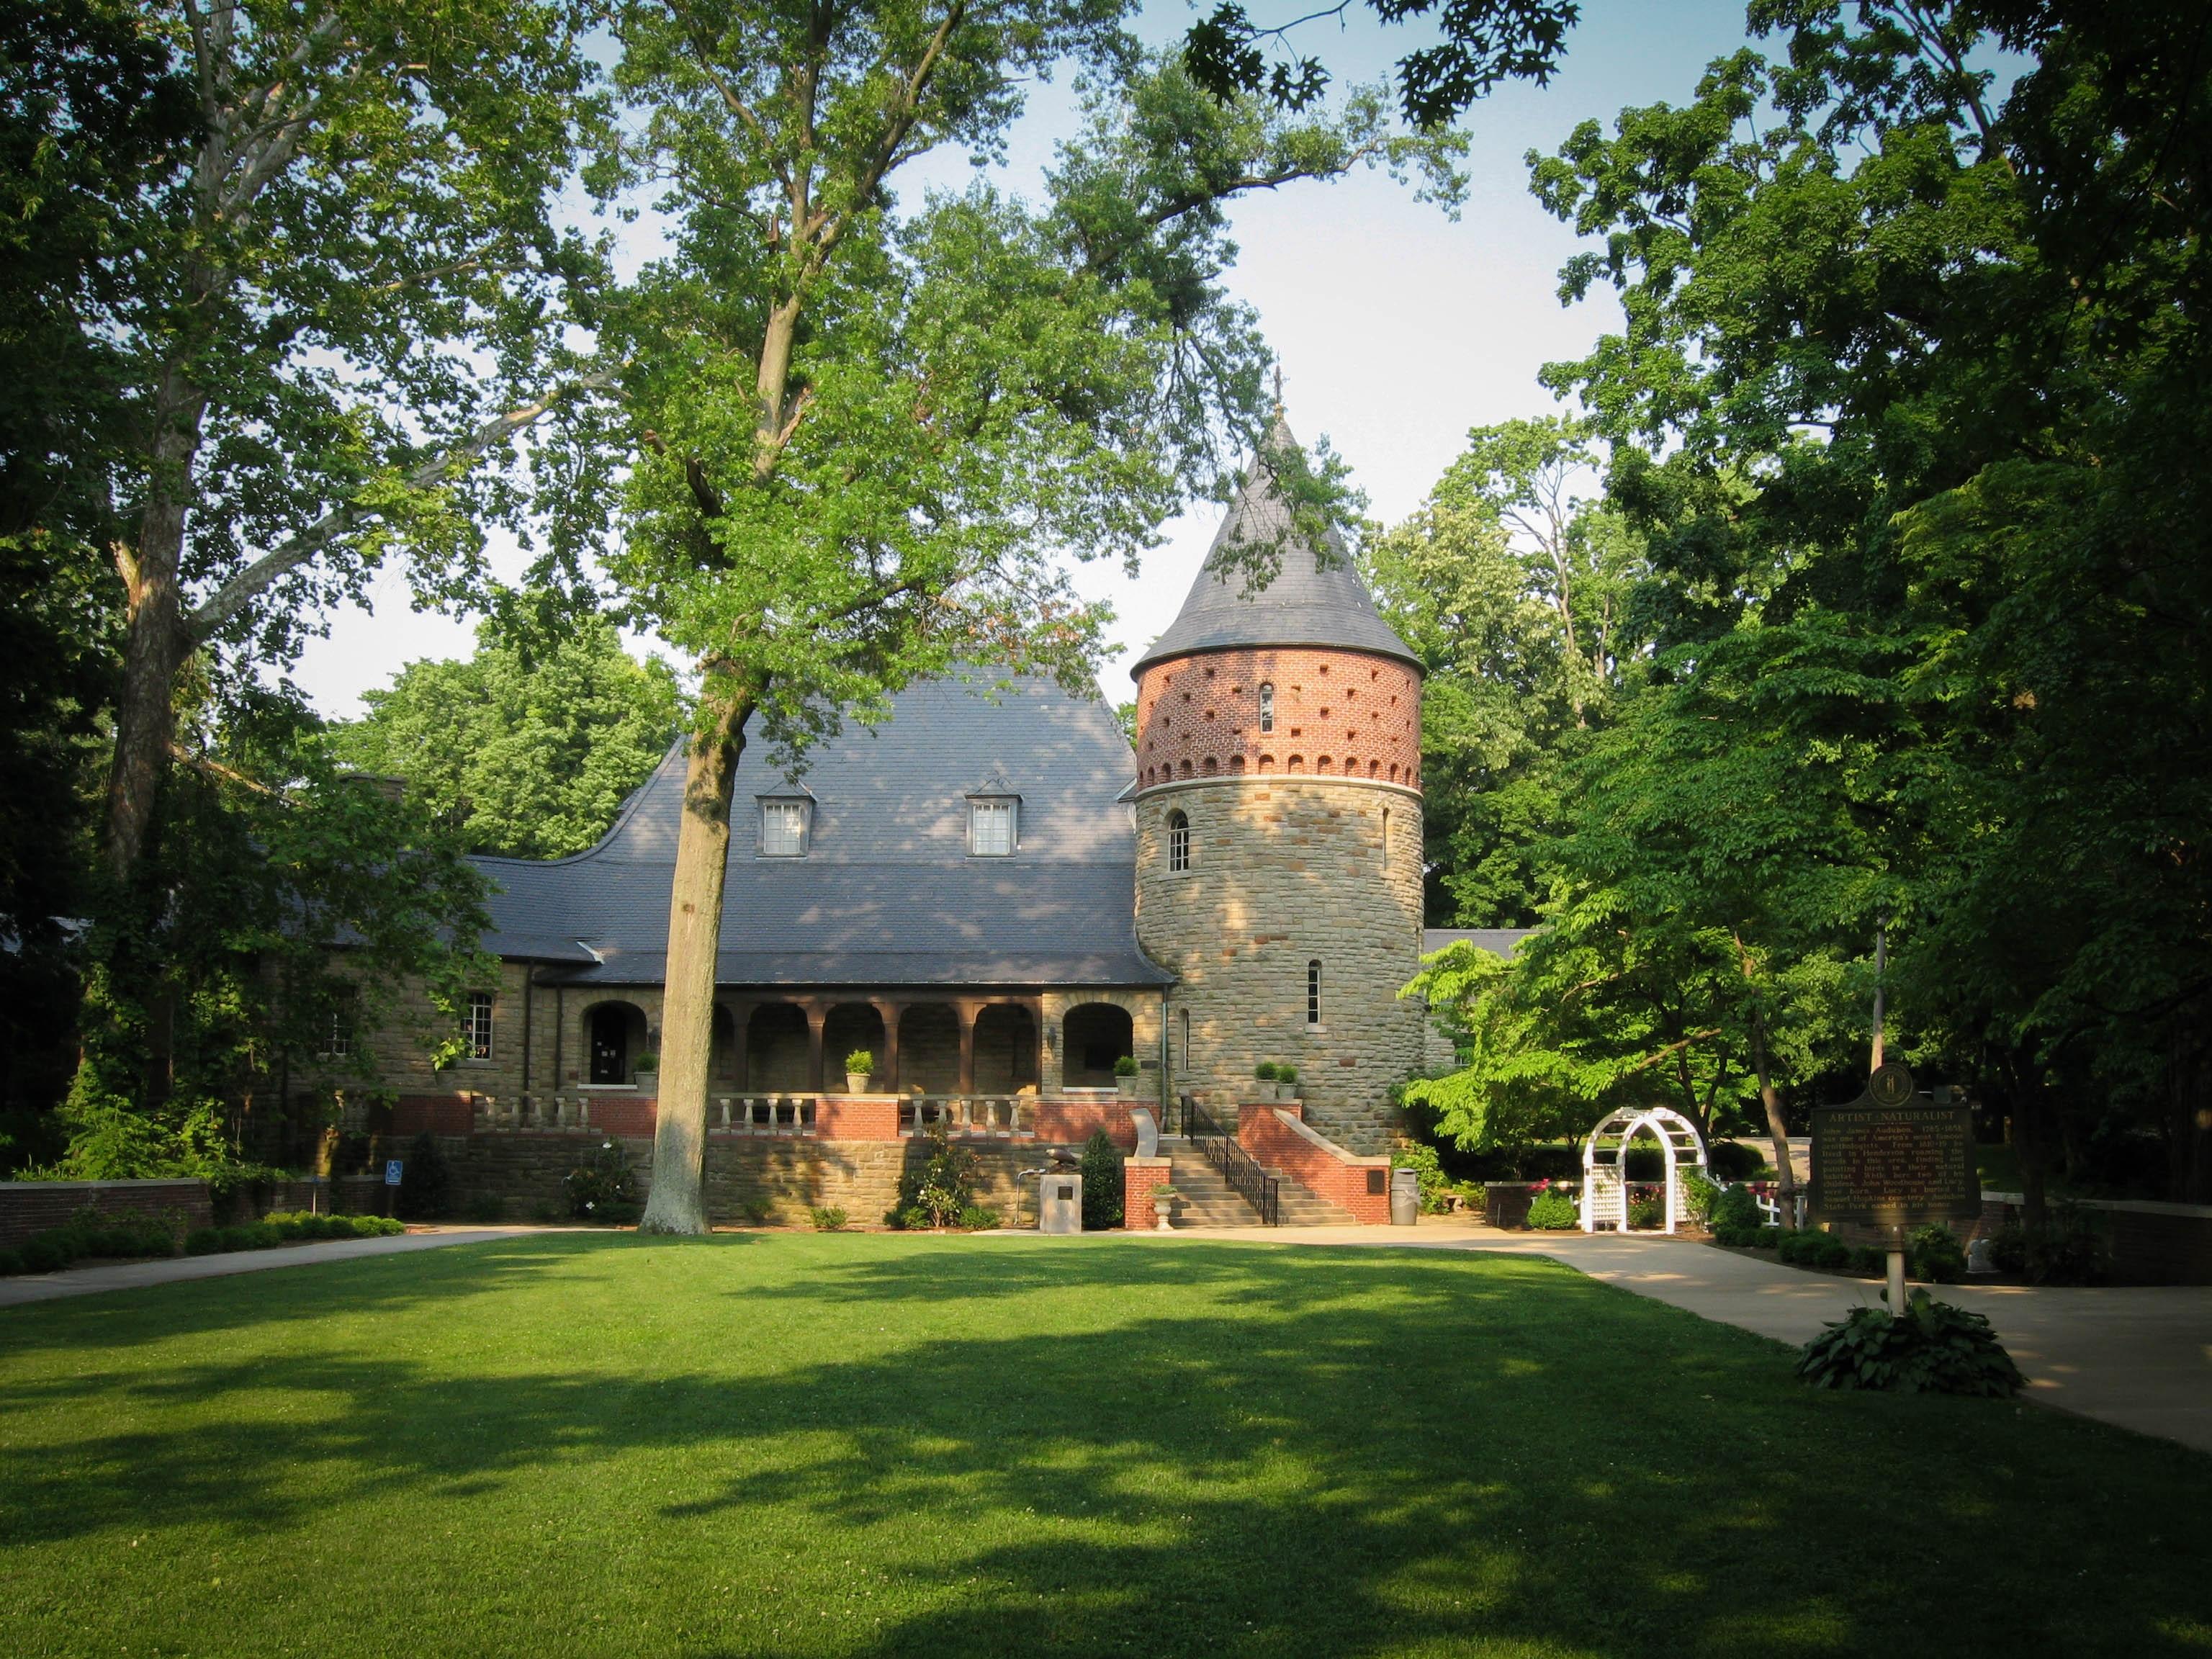 free images lawn mansion building chateau home park